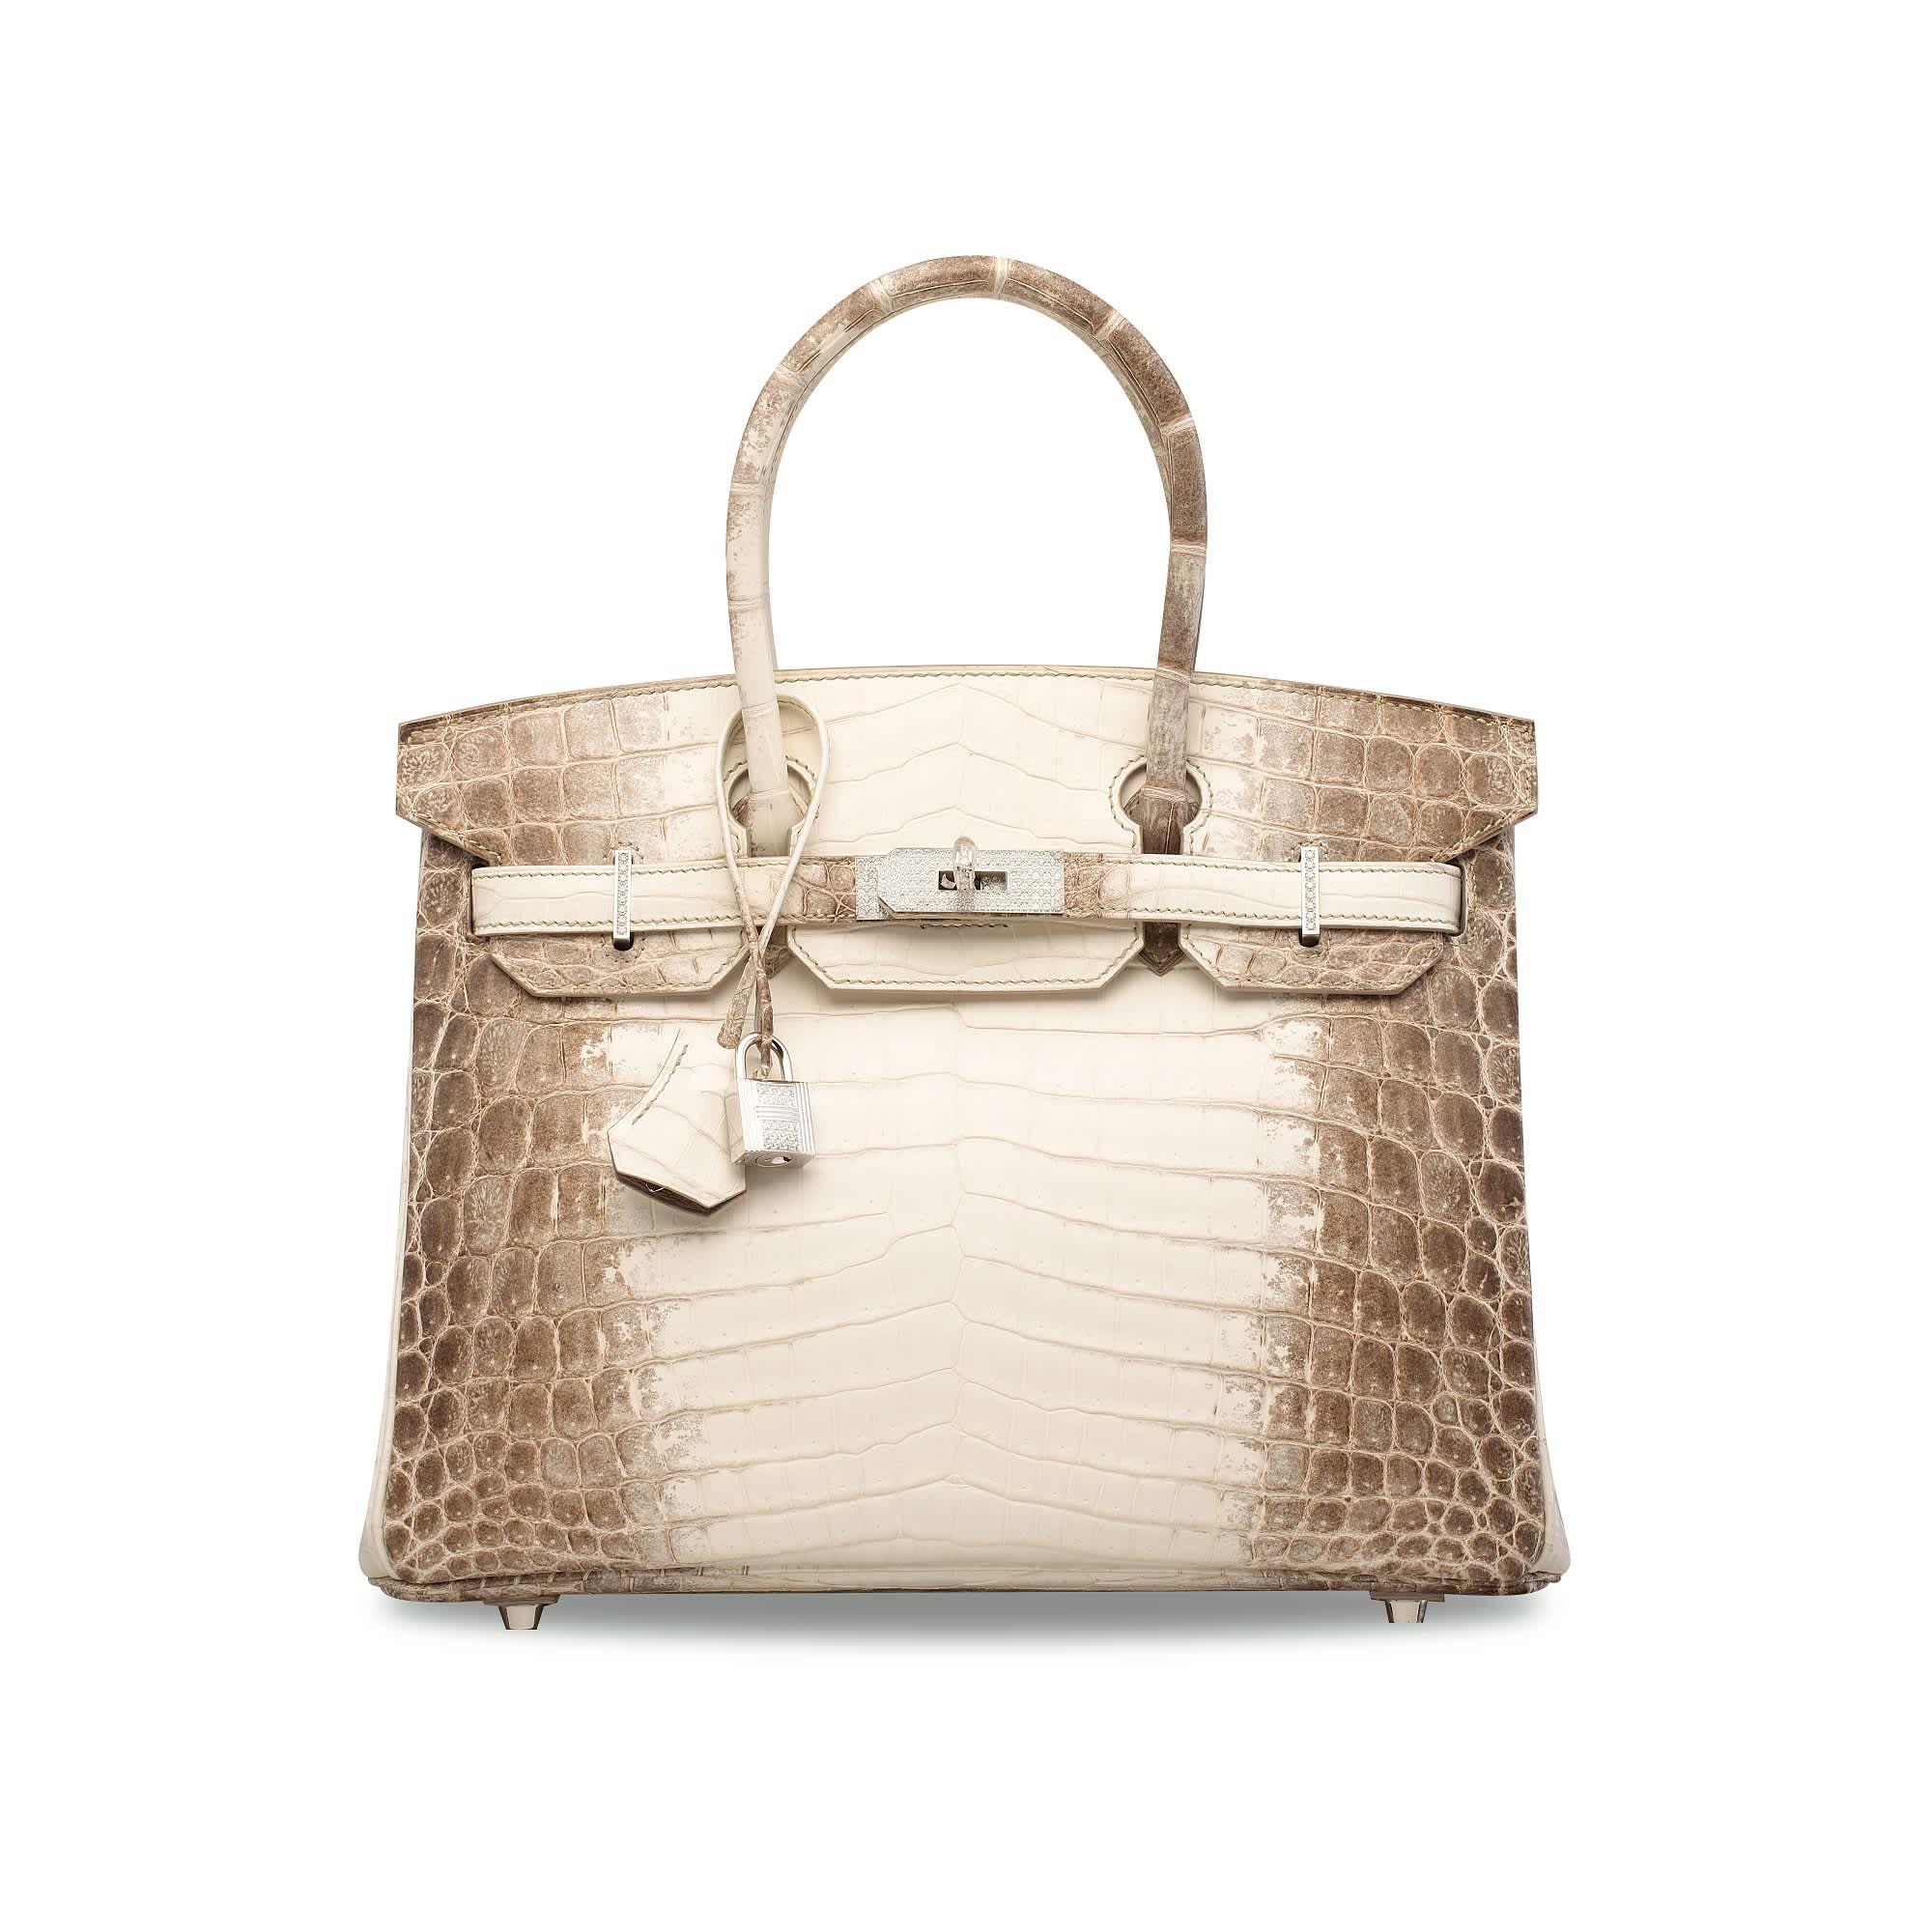 Diamond hermes ostrich bag